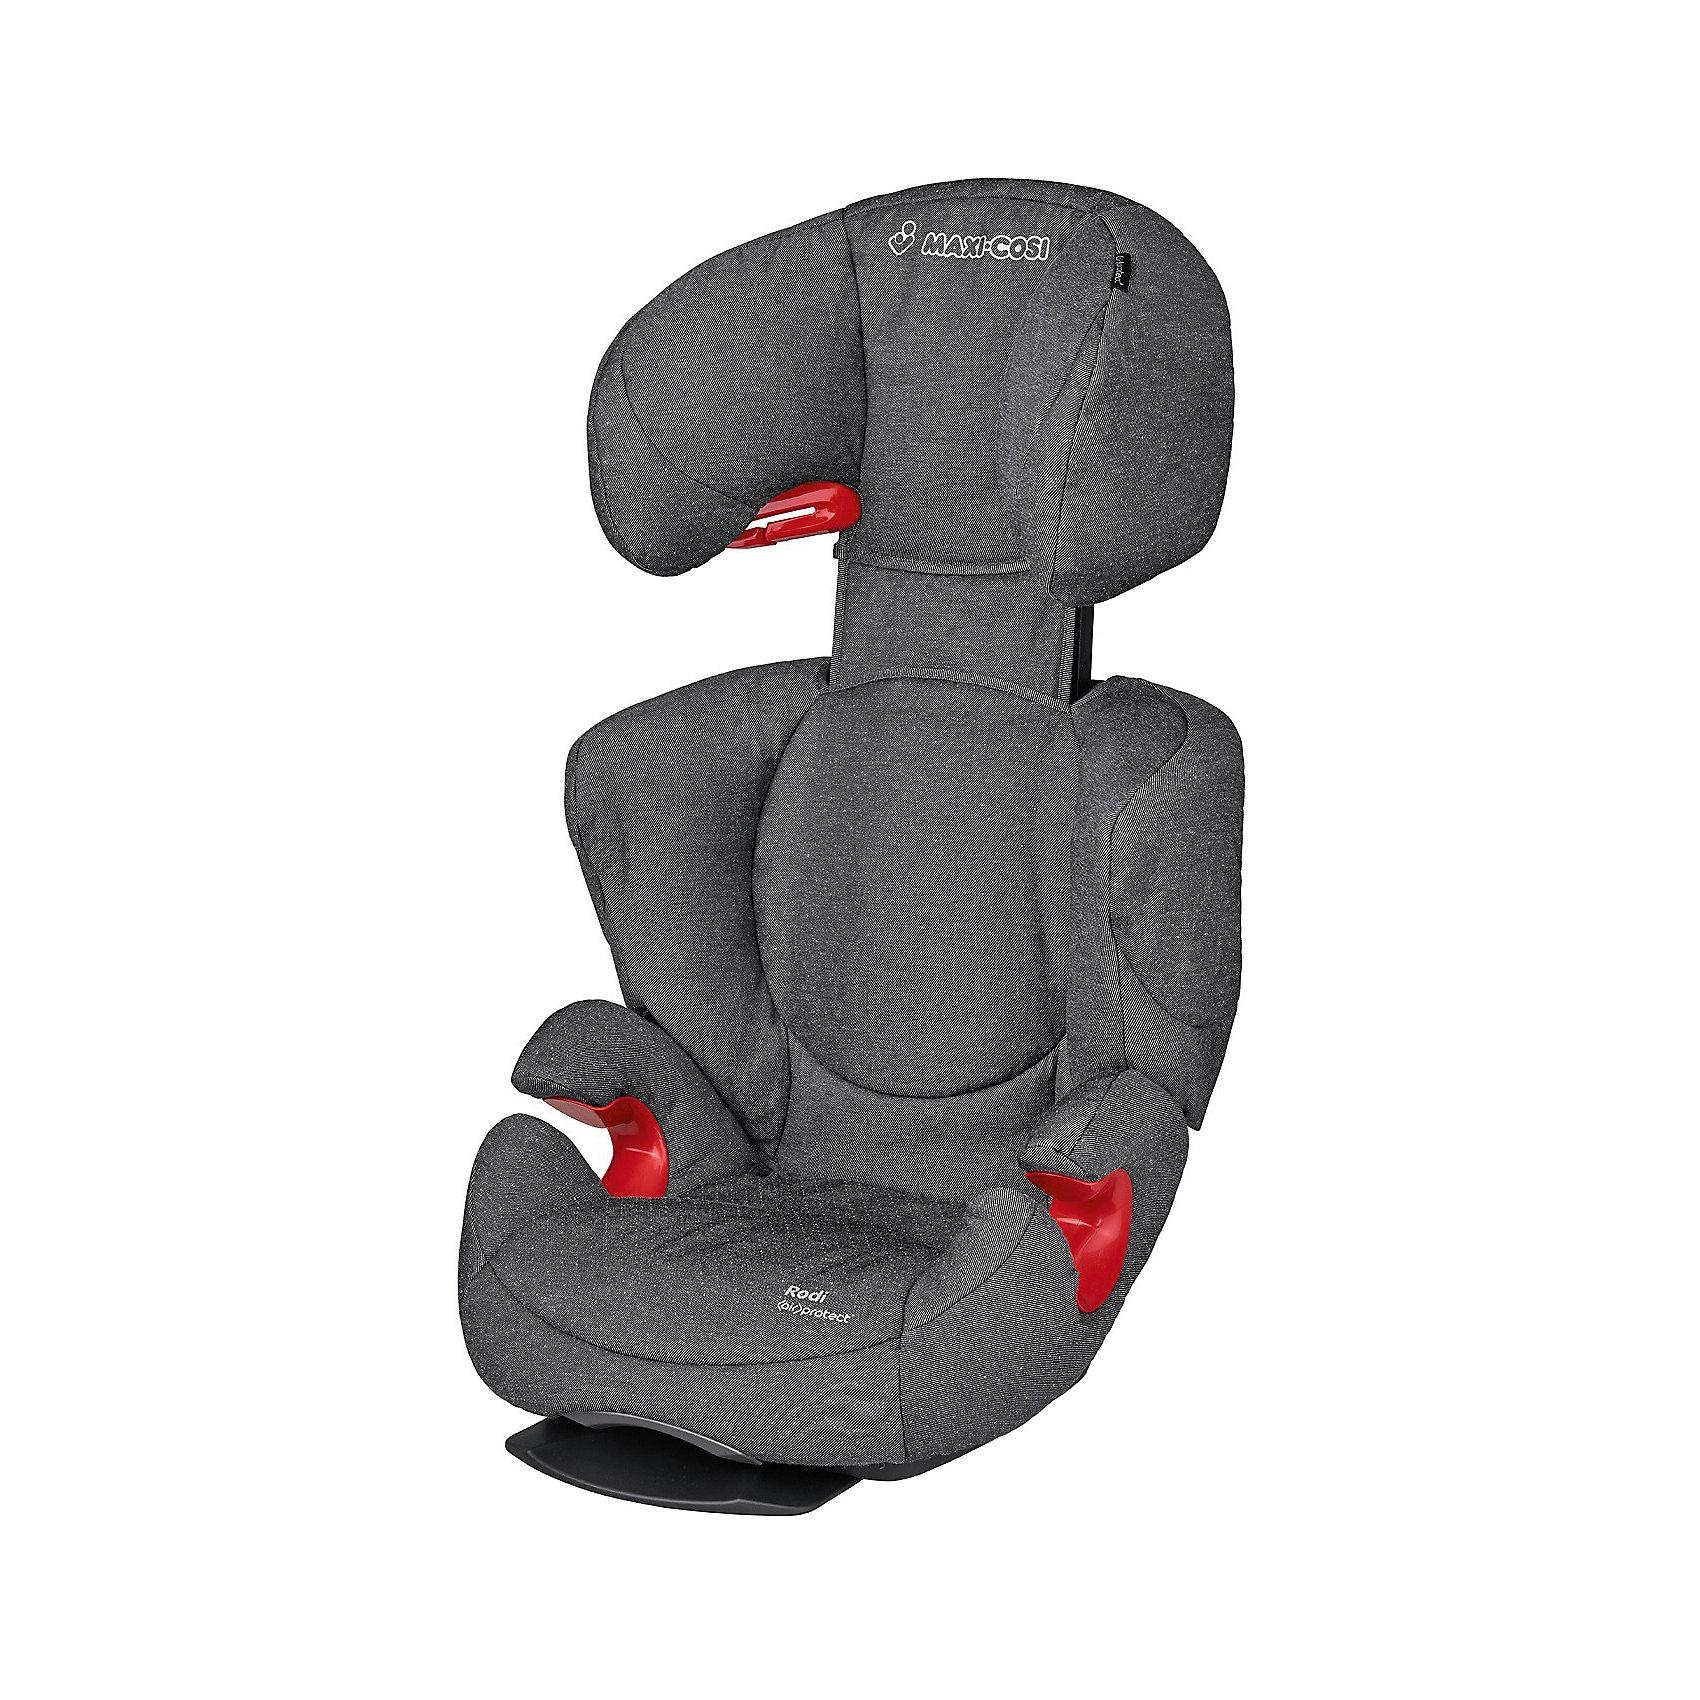 Maxi Cosi Автокресло Maxi-Cosi Rodi AirProtect 15-36 кг, Sparkling Grey